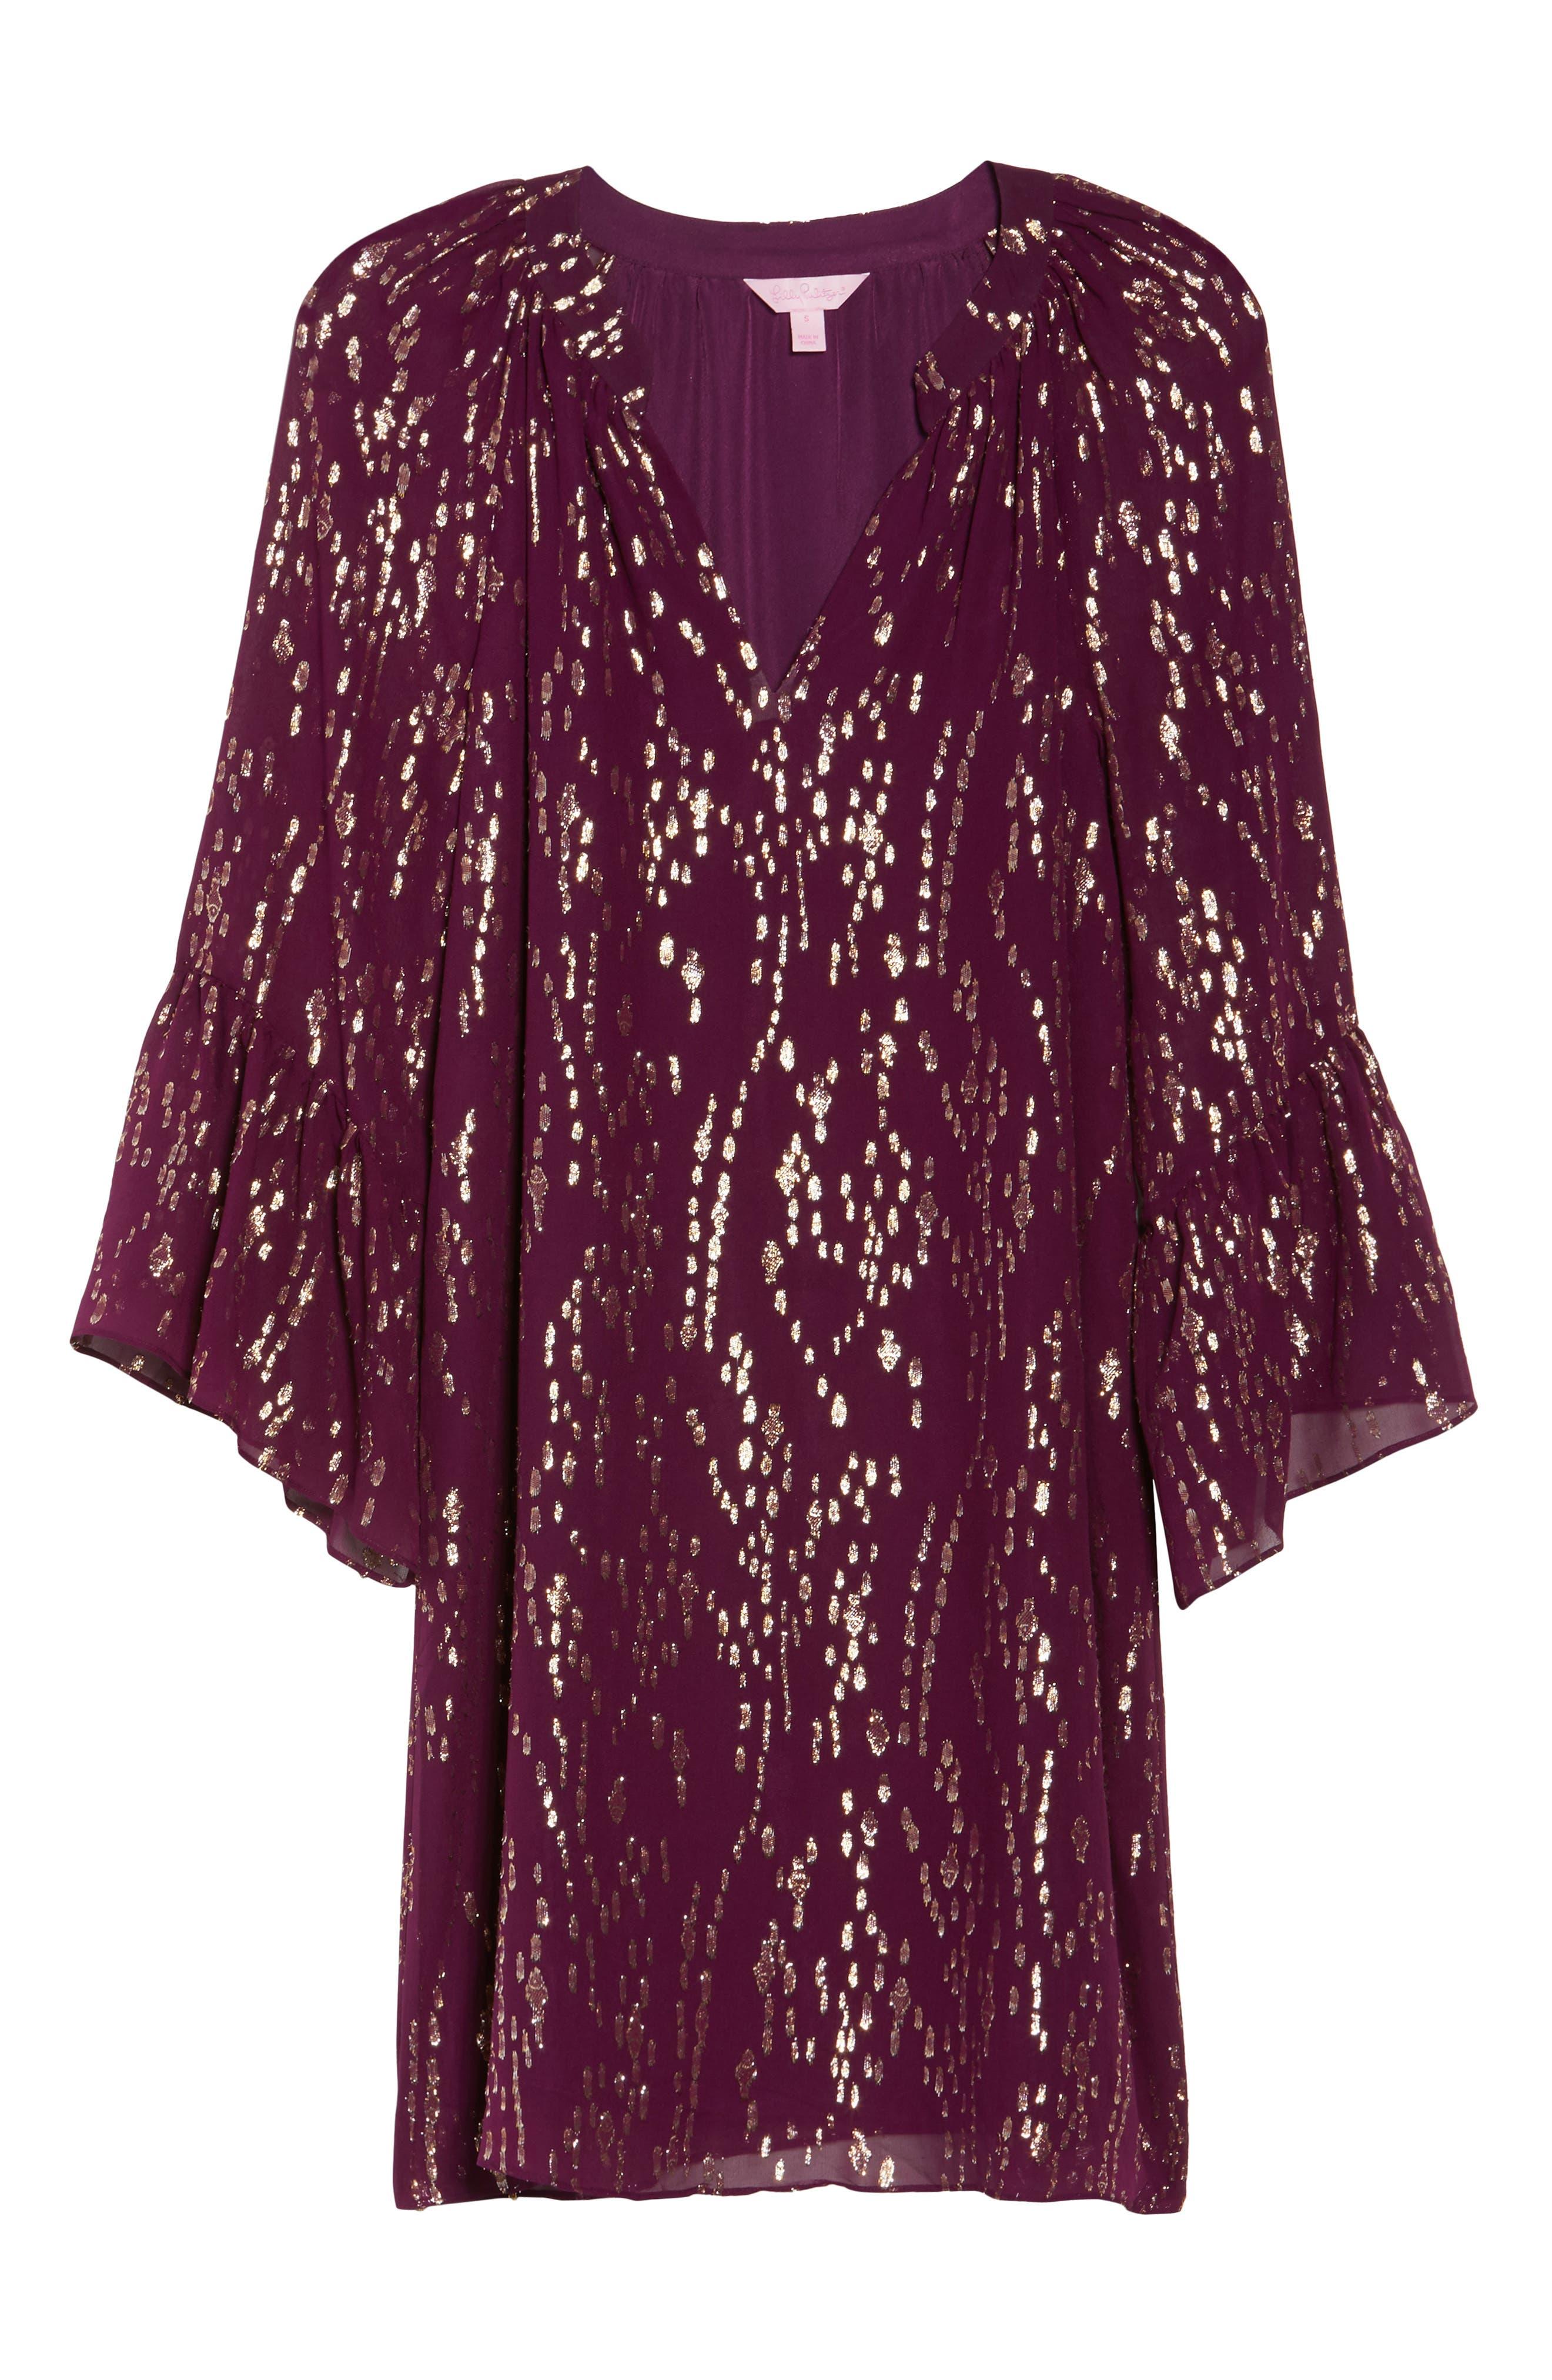 Matilda Tunic Dress,                             Alternate thumbnail 6, color,                             Shiraz